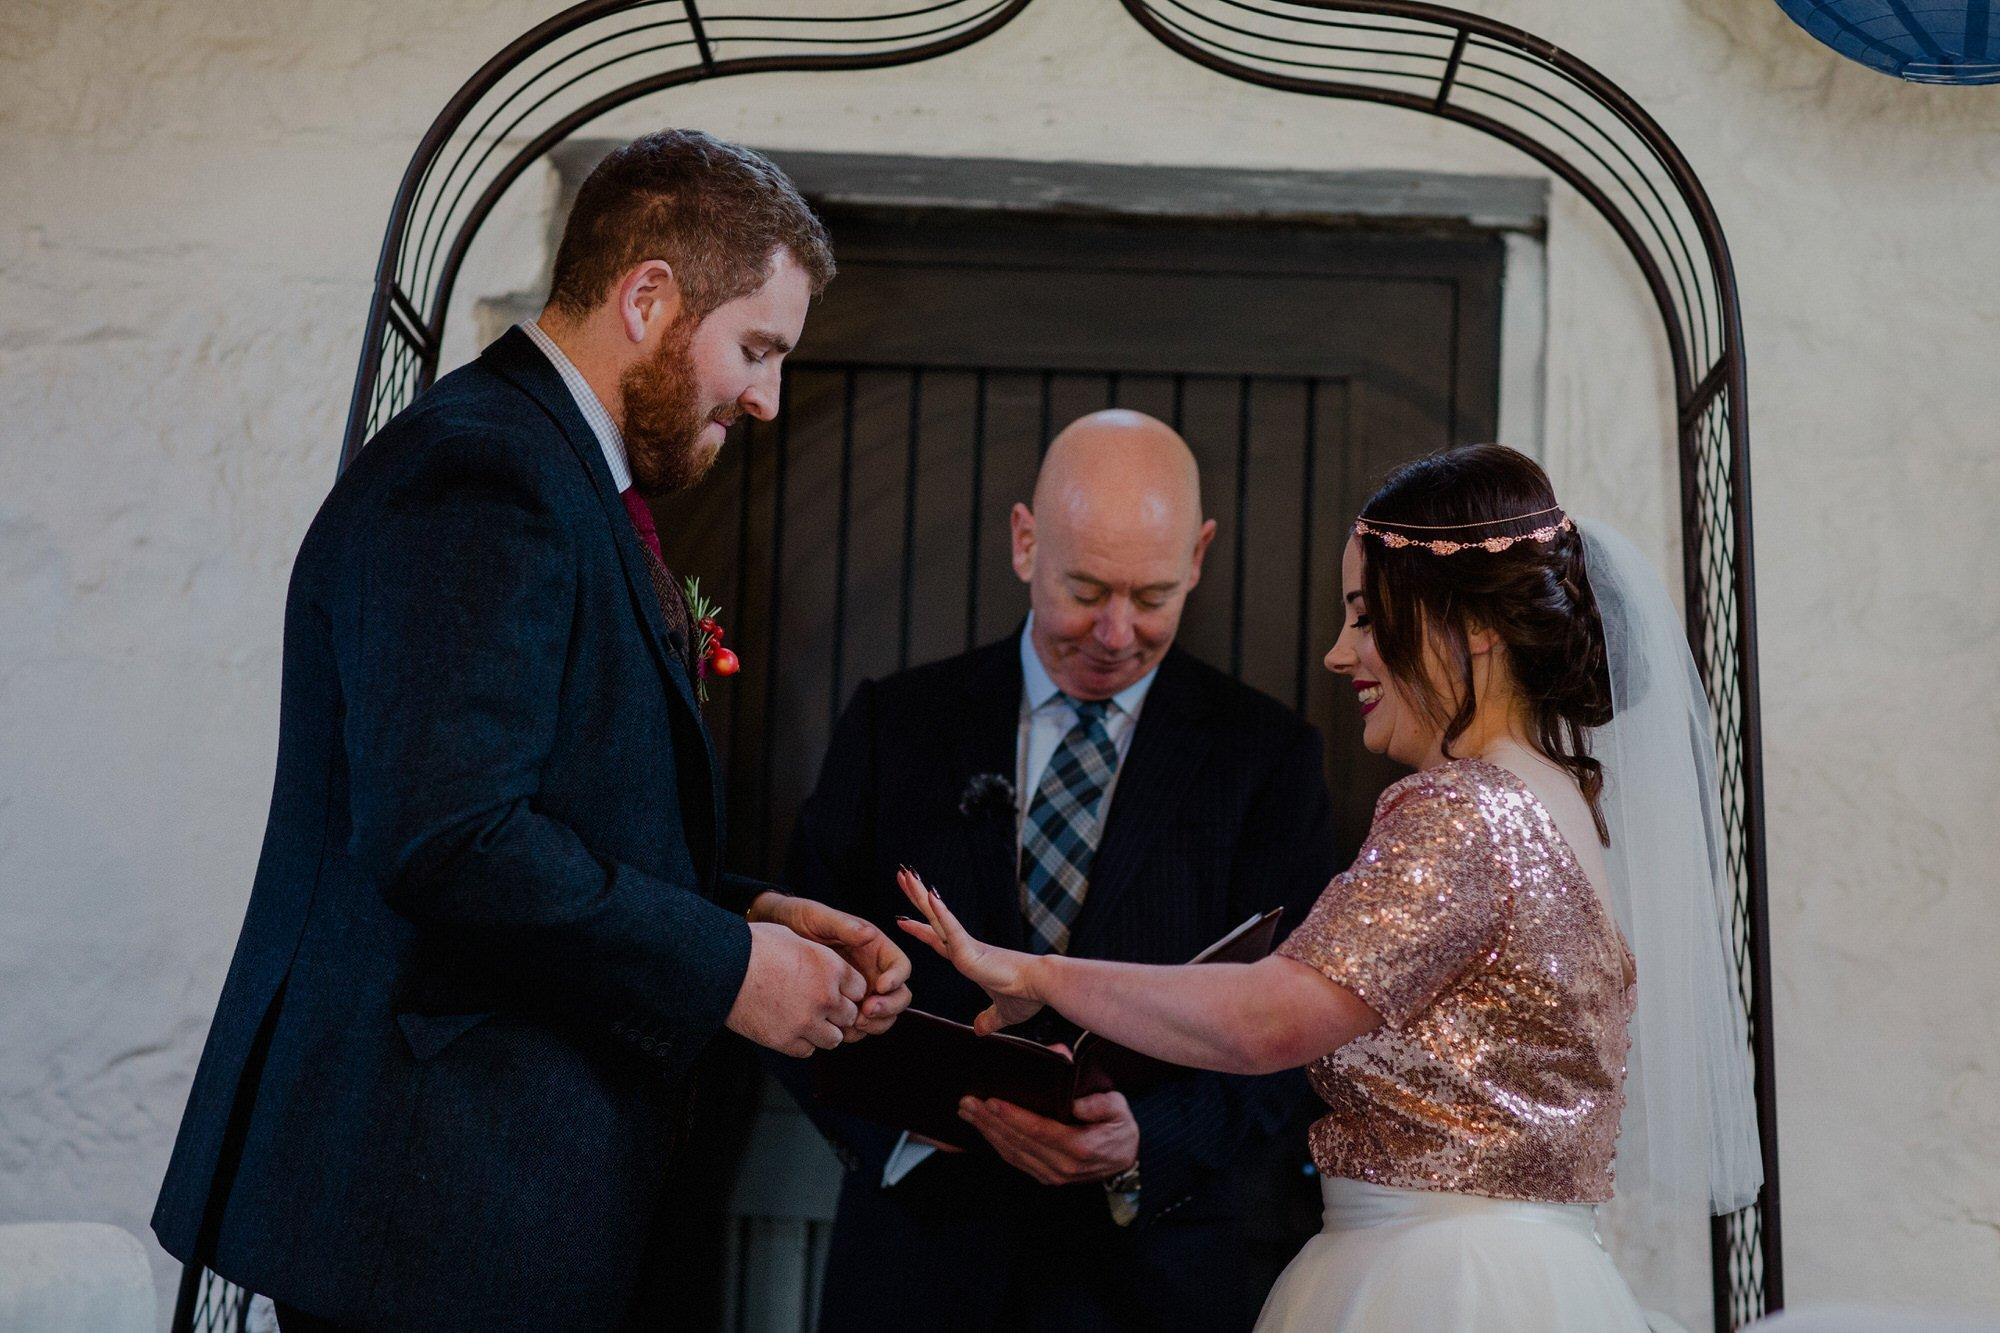 027 TIN SHED KNOCKRAICH FARM WEDDING ALTERNATIVE BRIDE ZOE ALEXANDRA PHOTOGRAPHY